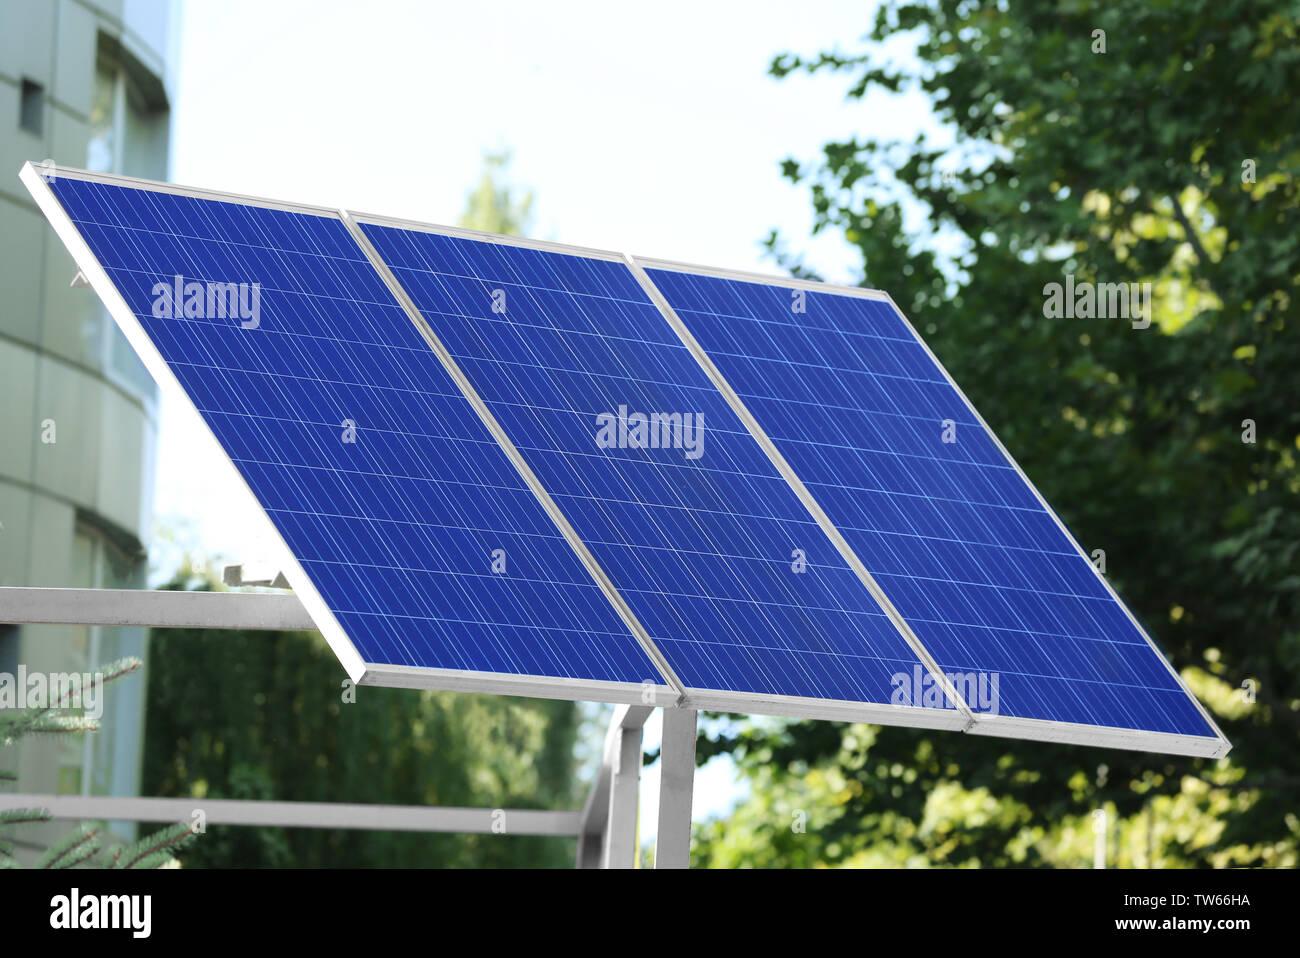 Panel solar en construcción metálica exterior Imagen De Stock